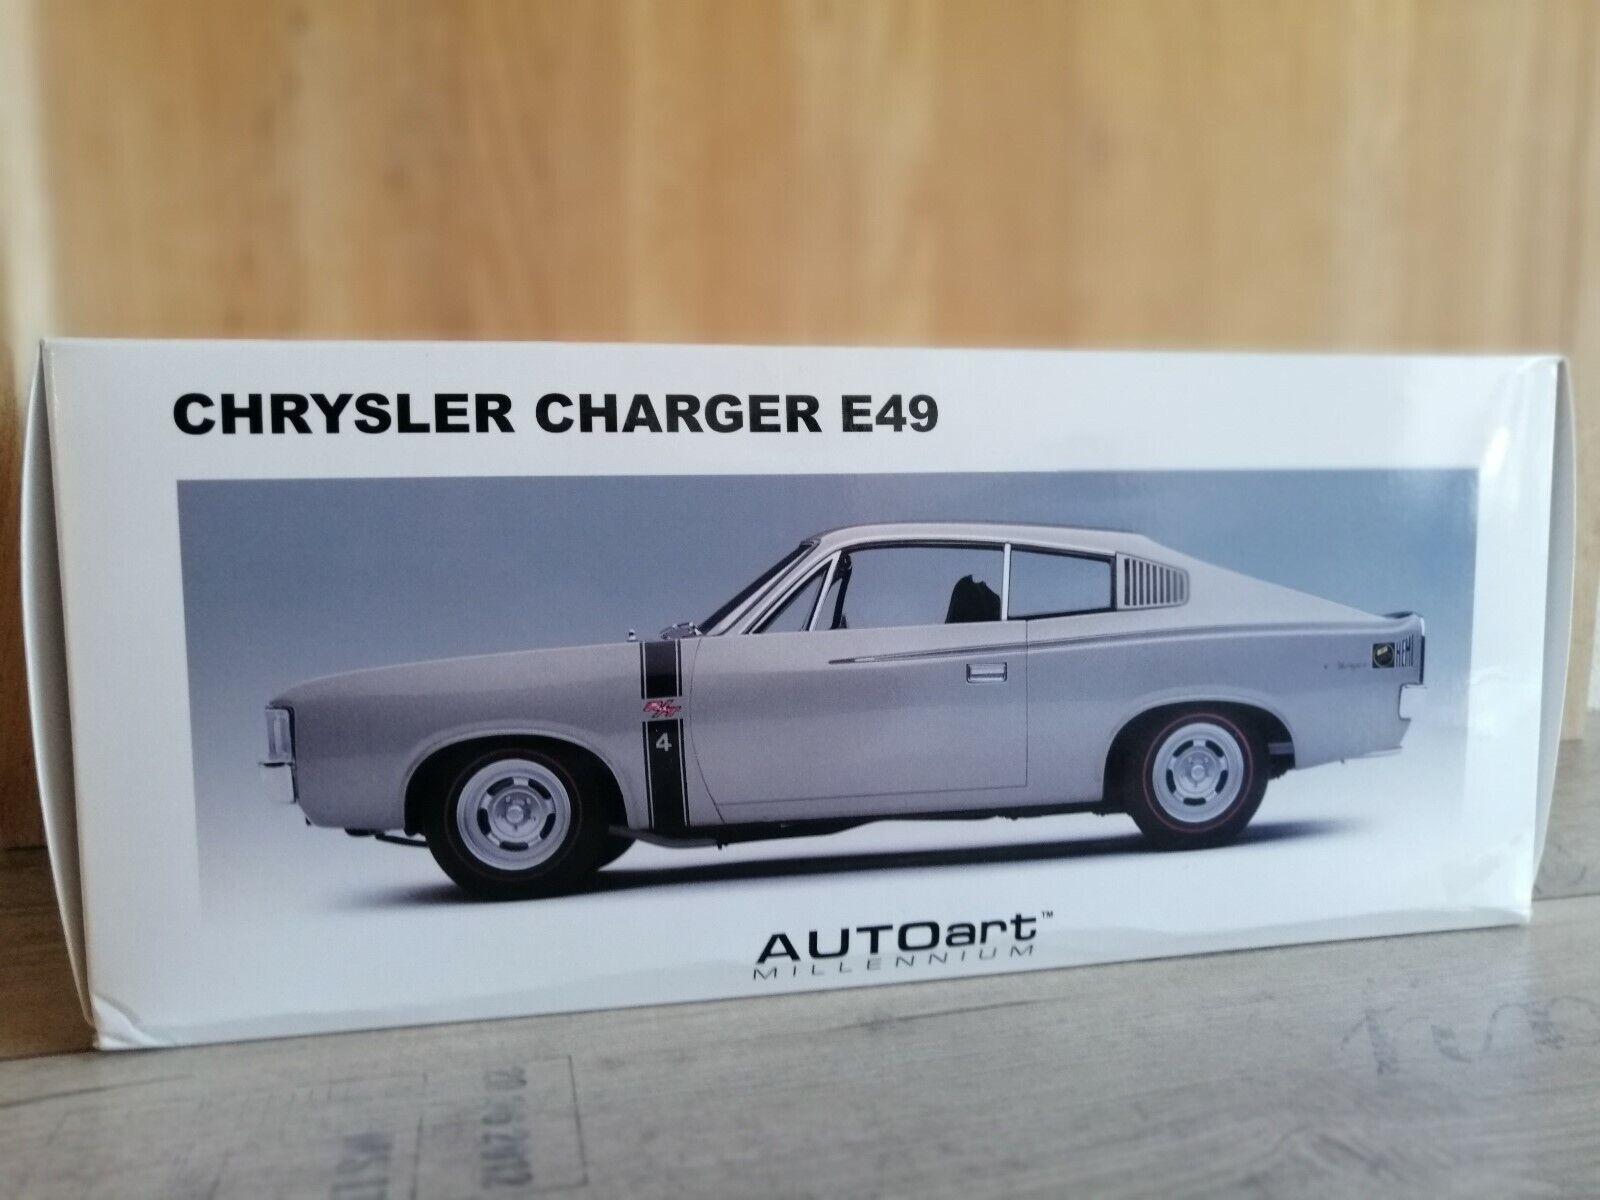 Chrysler Charger E49  Autoart 1 18 NEU  | Reichhaltiges Design